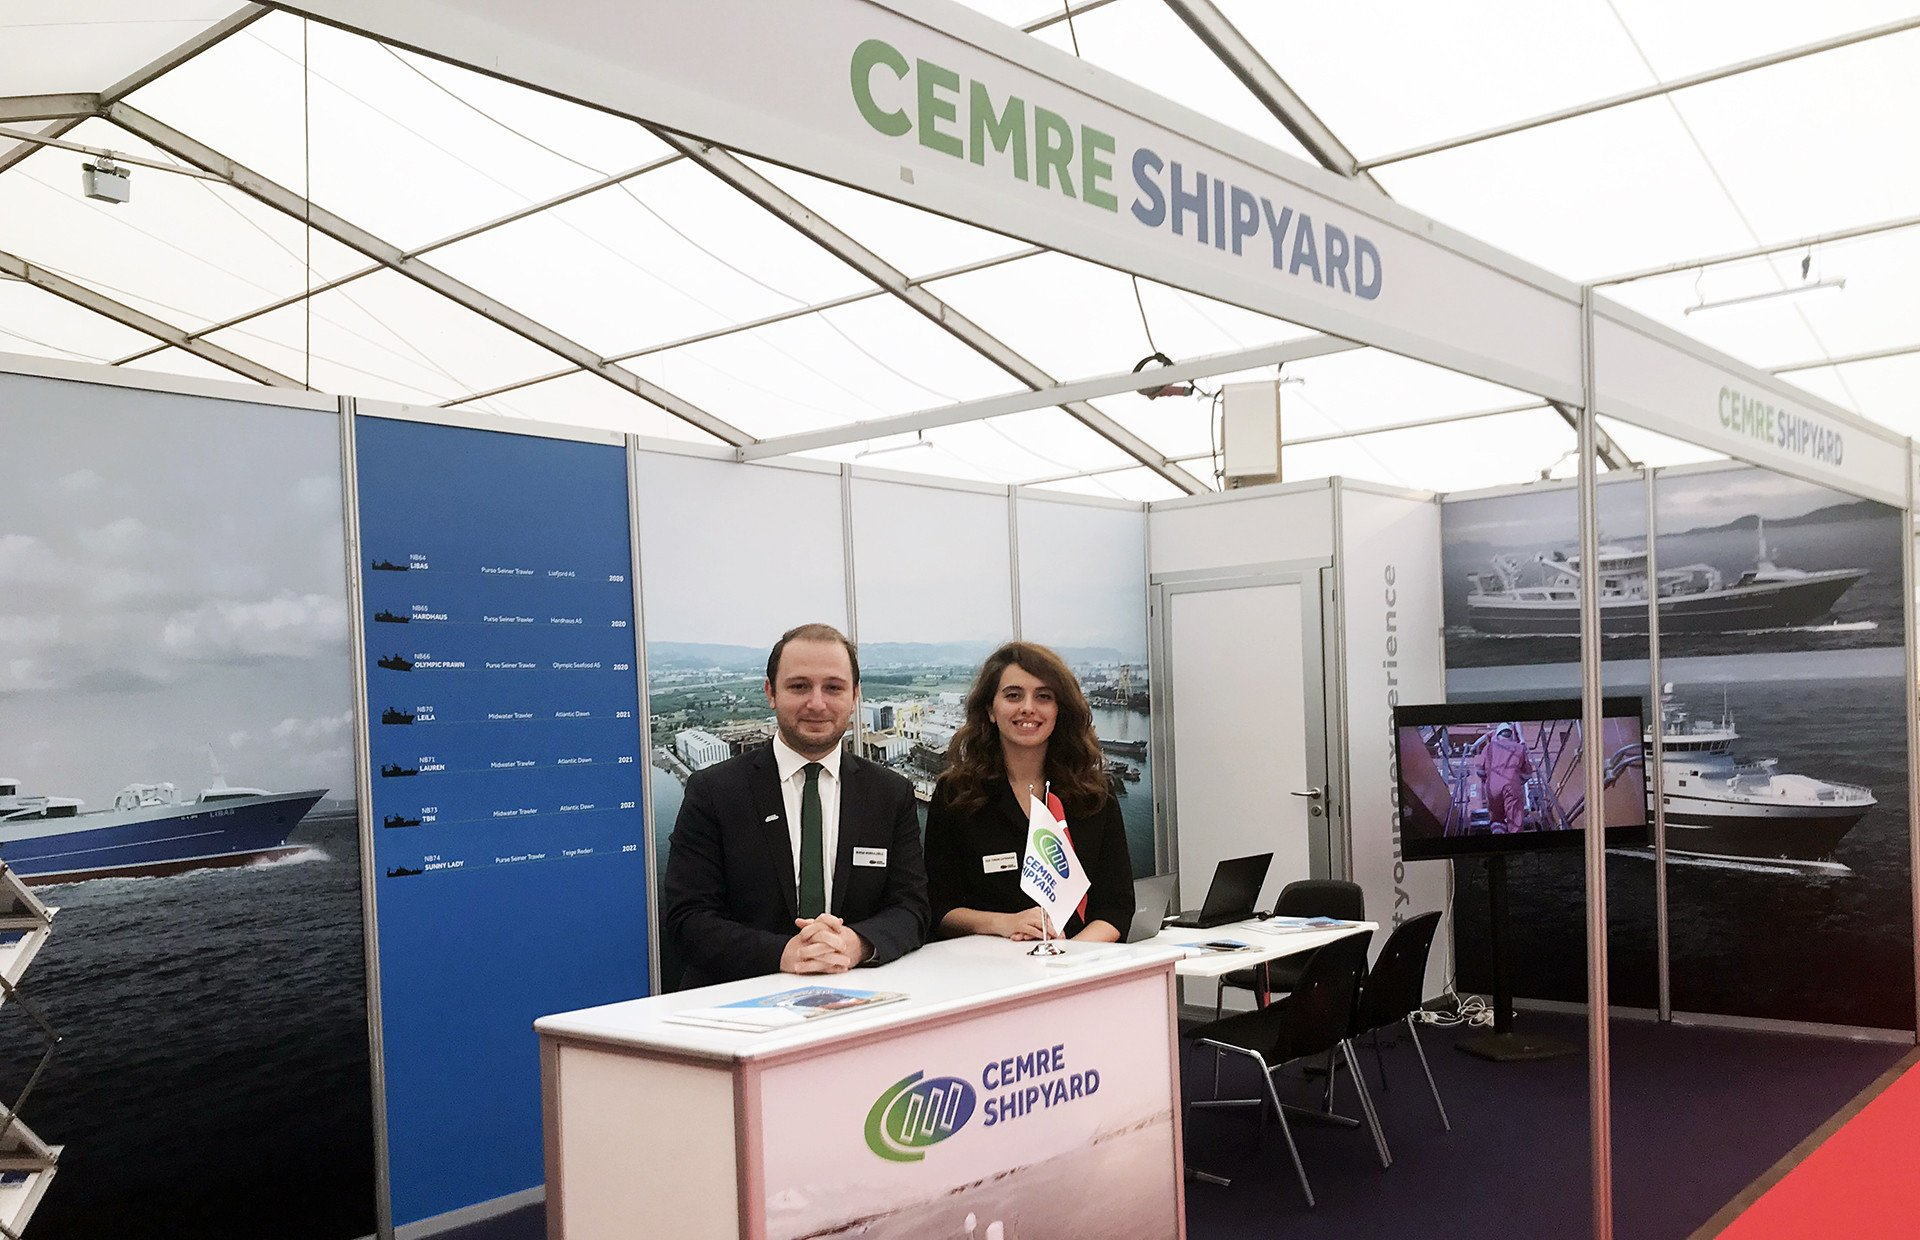 Cemre Shipyard is Exhibitor at DanFish 2019!